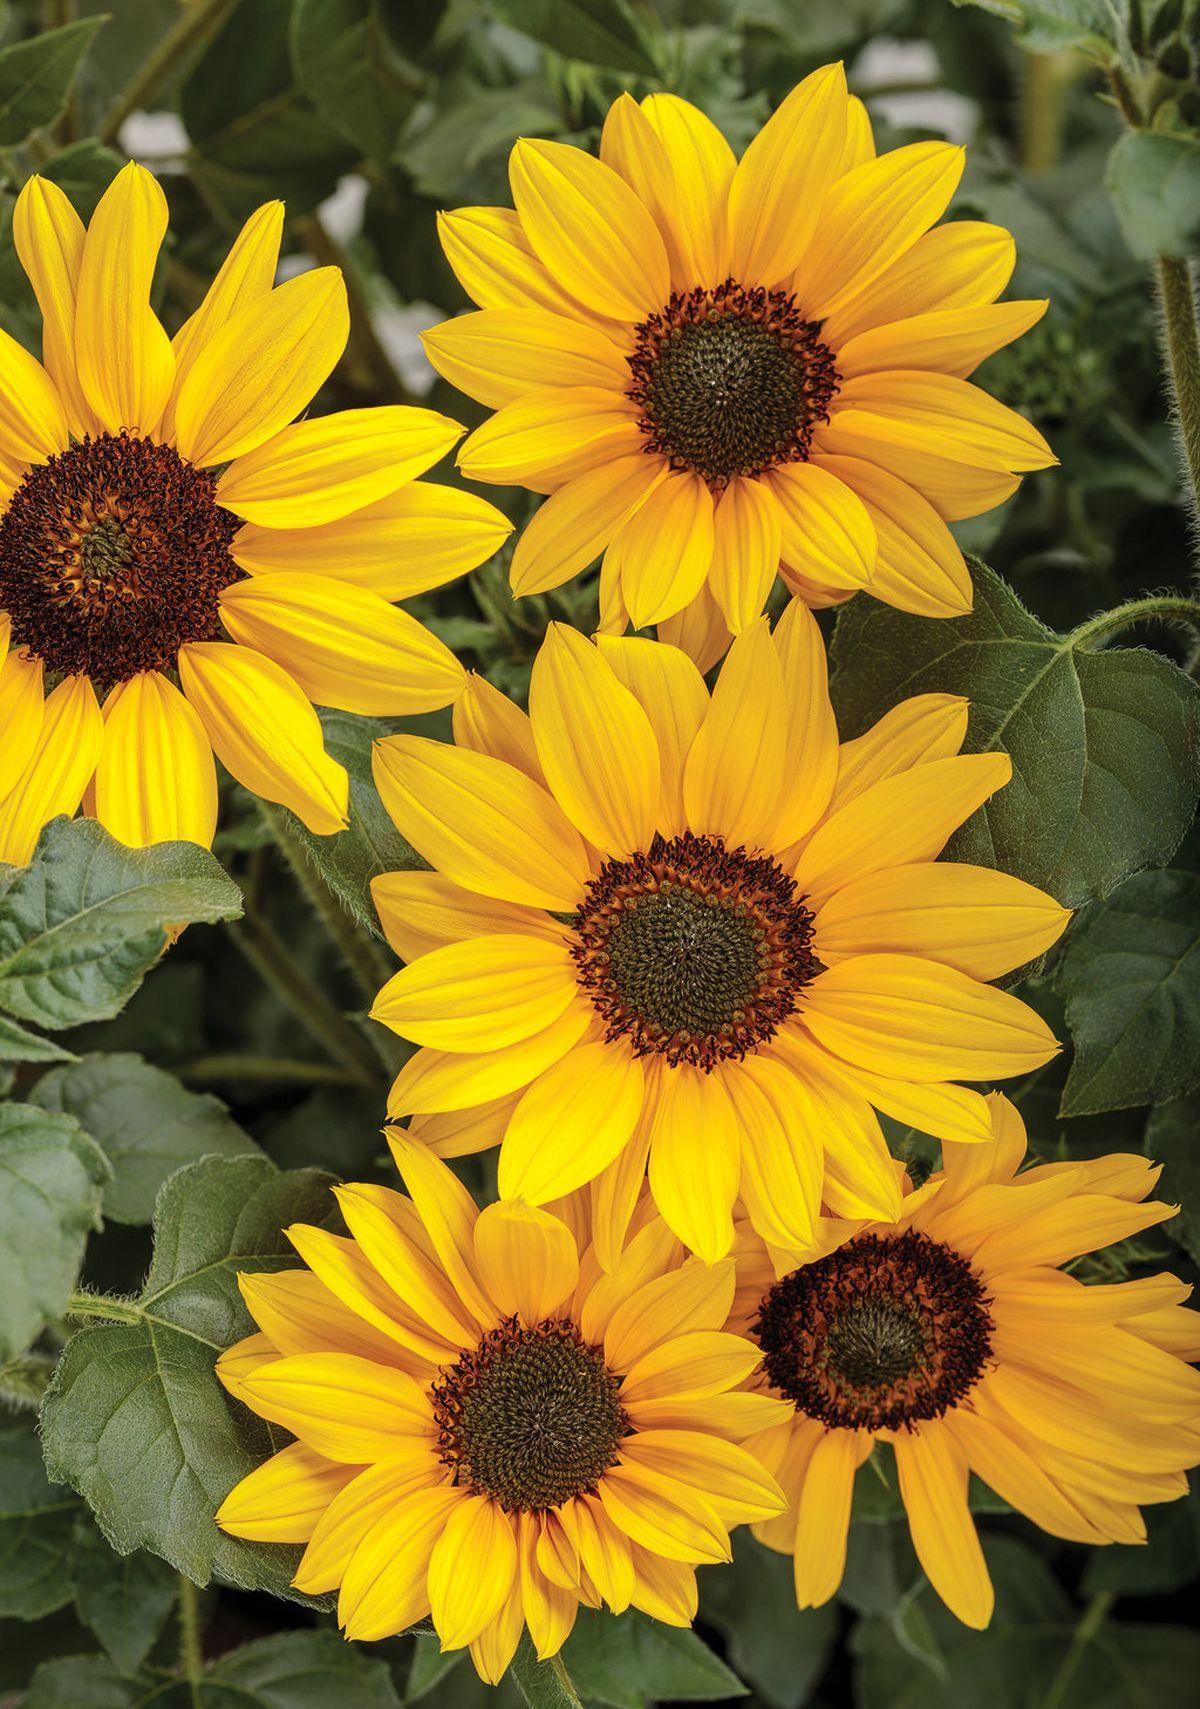 Suncredible Yellow Sunflower Sunflower Pictures Sunflower Flower Yellow Sunflower